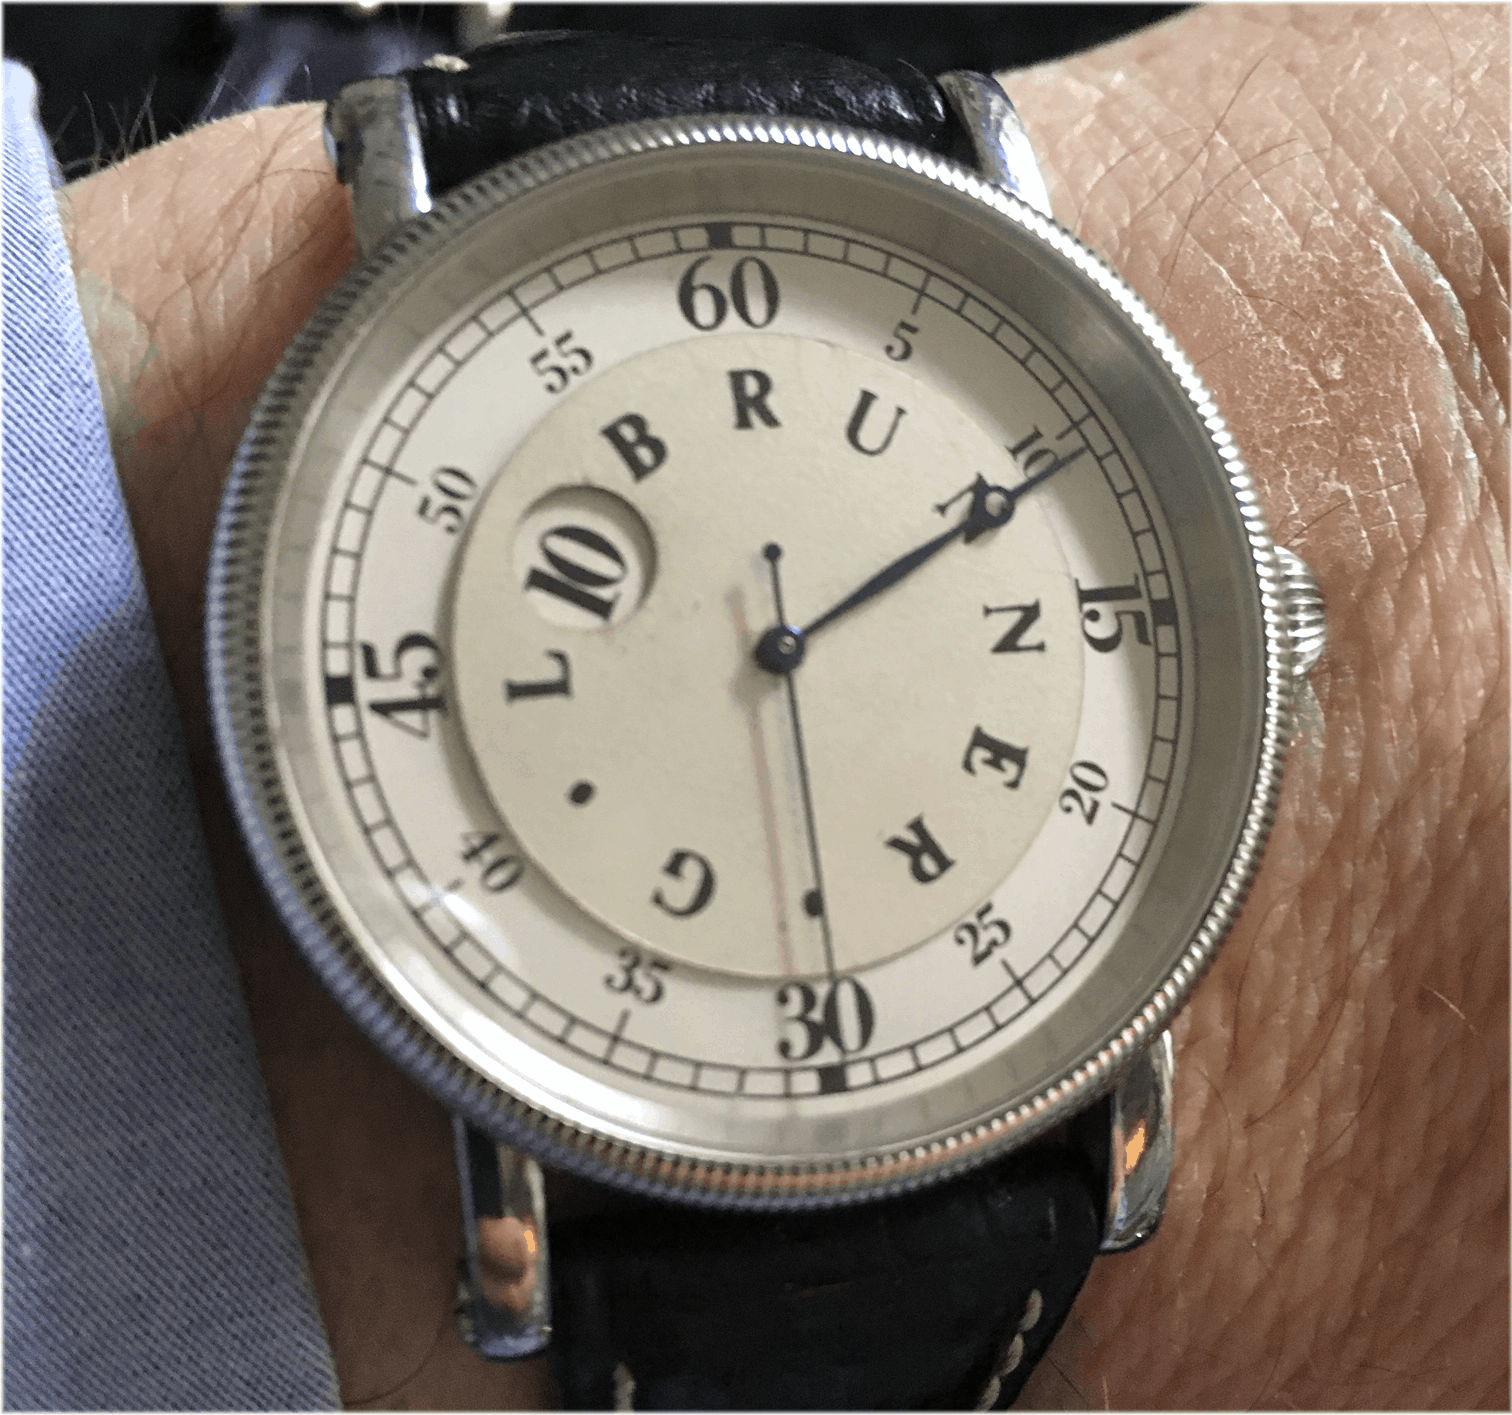 Leonardo Spinelli Armbanduhr mit springender Stundenanzeige G. L. Brunner